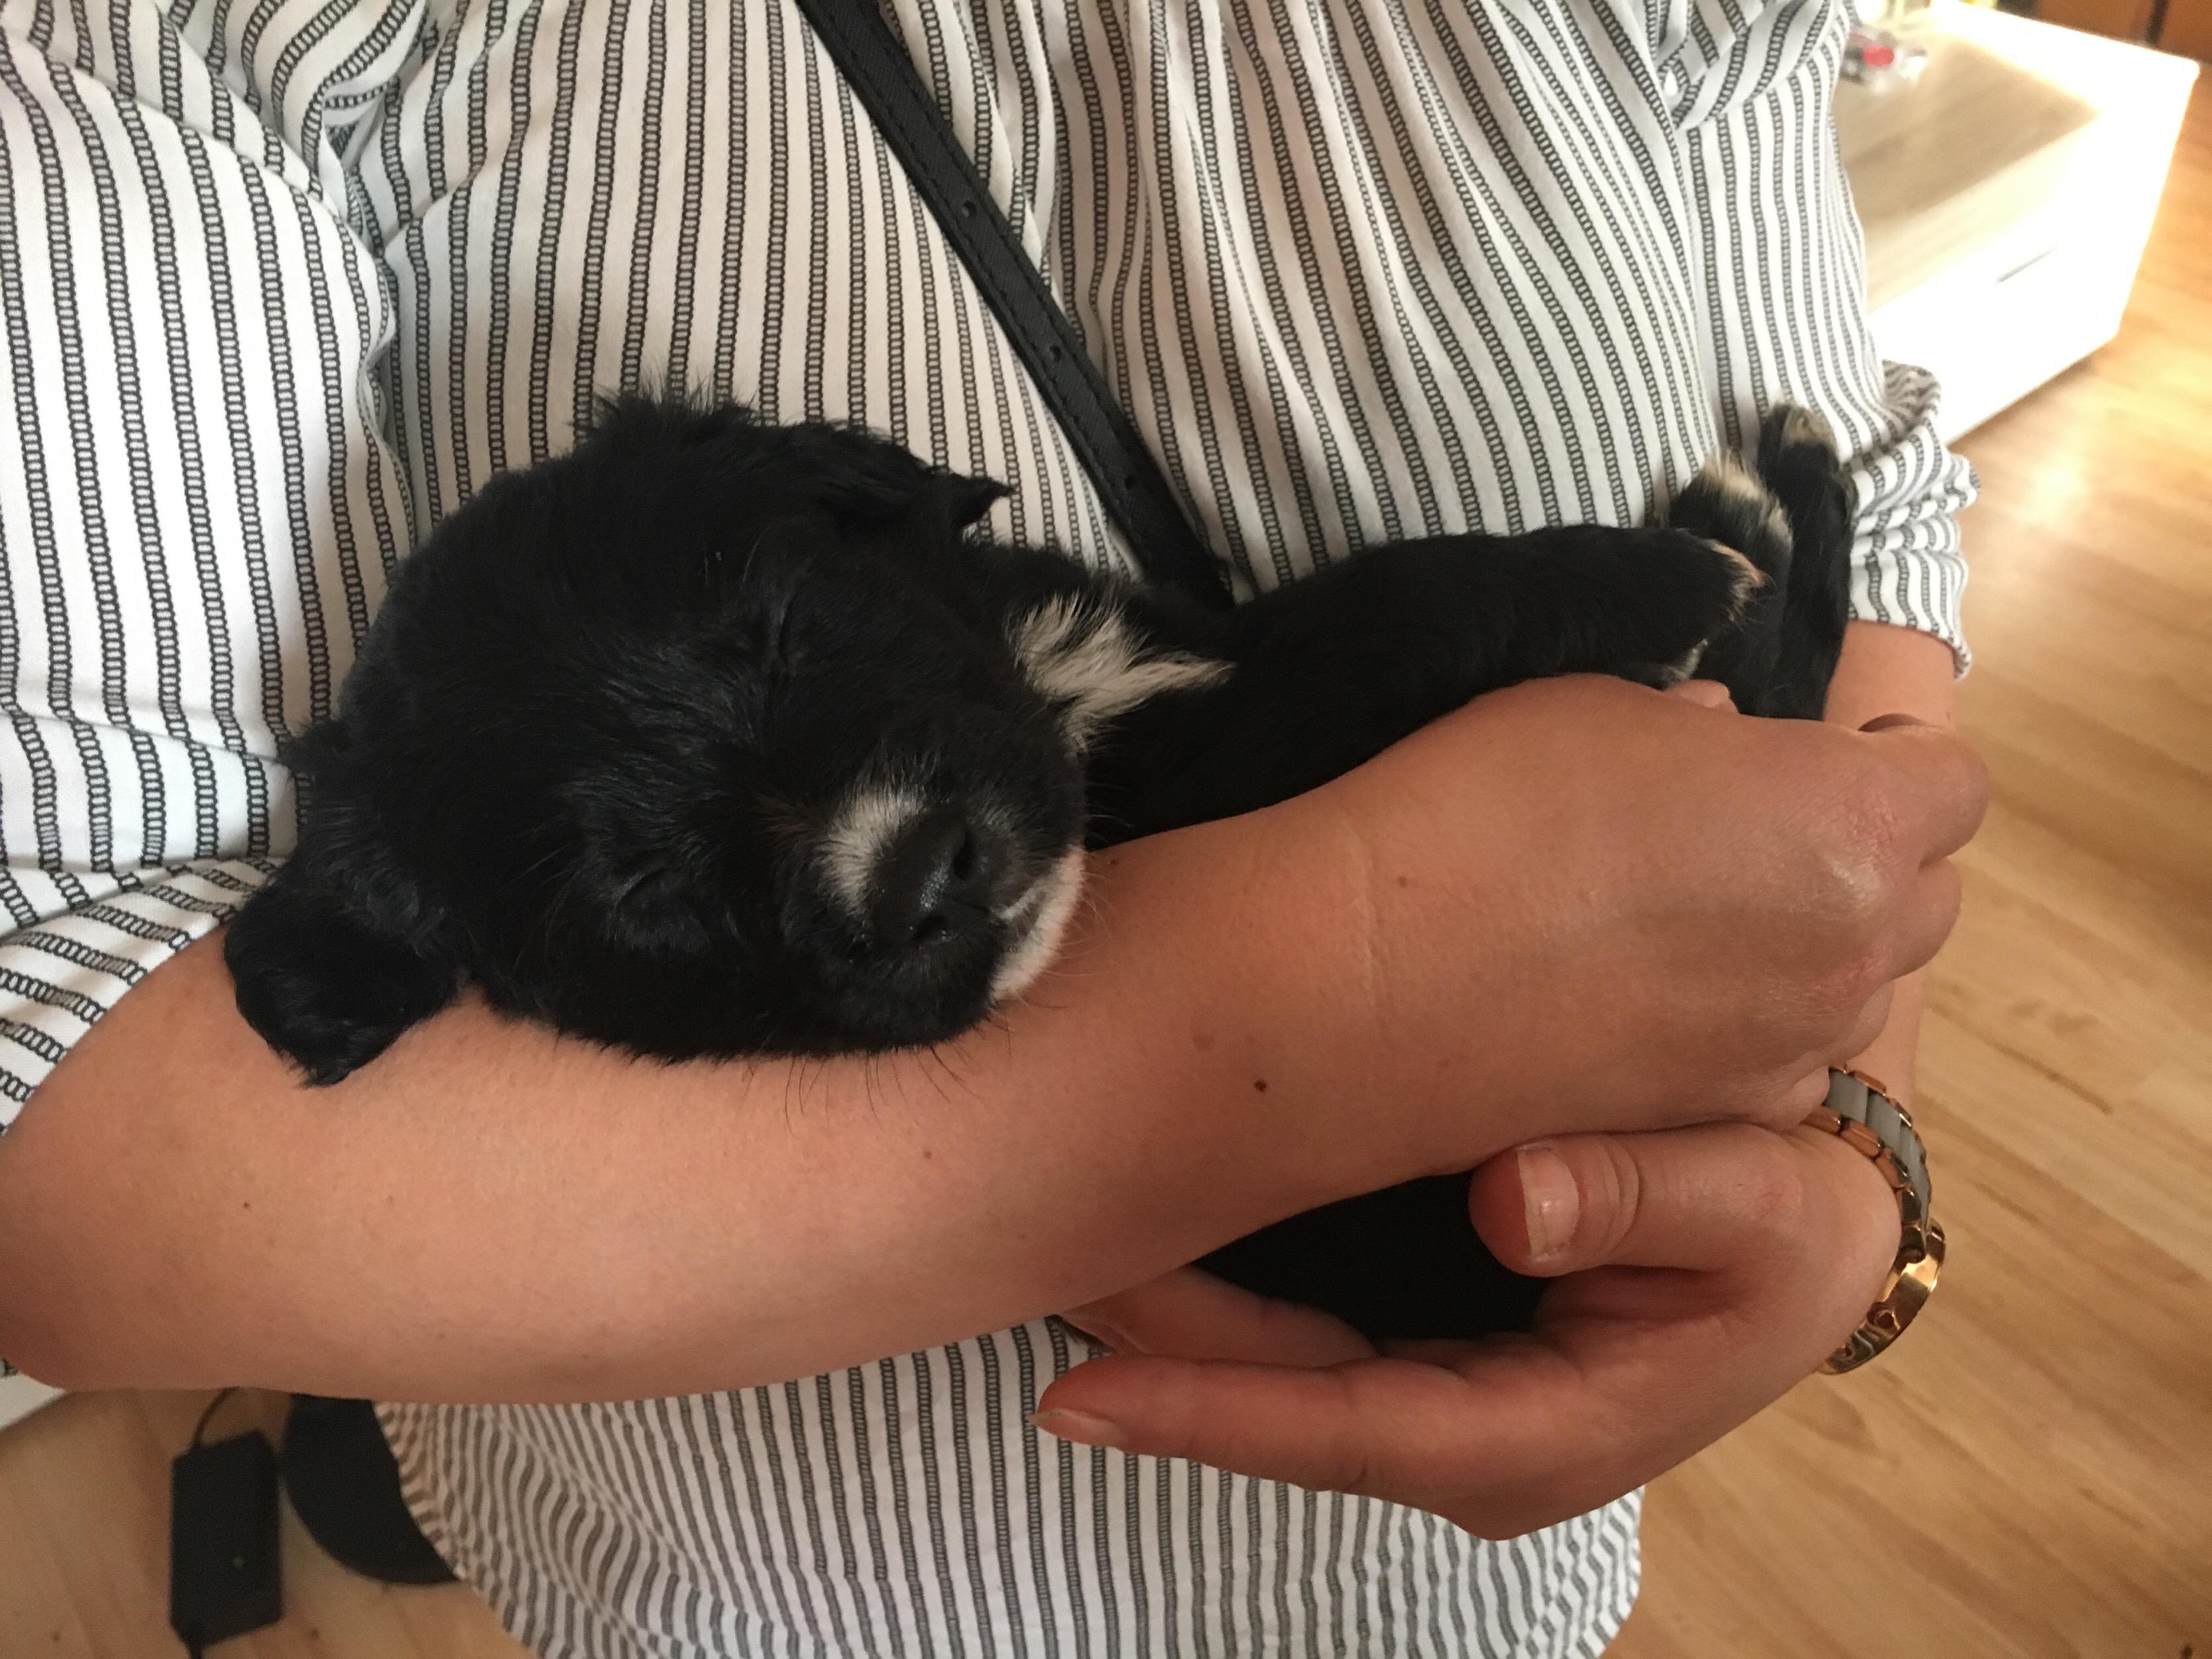 Cute Dog Puppy Sleep Sleeping Black Doggo Image By